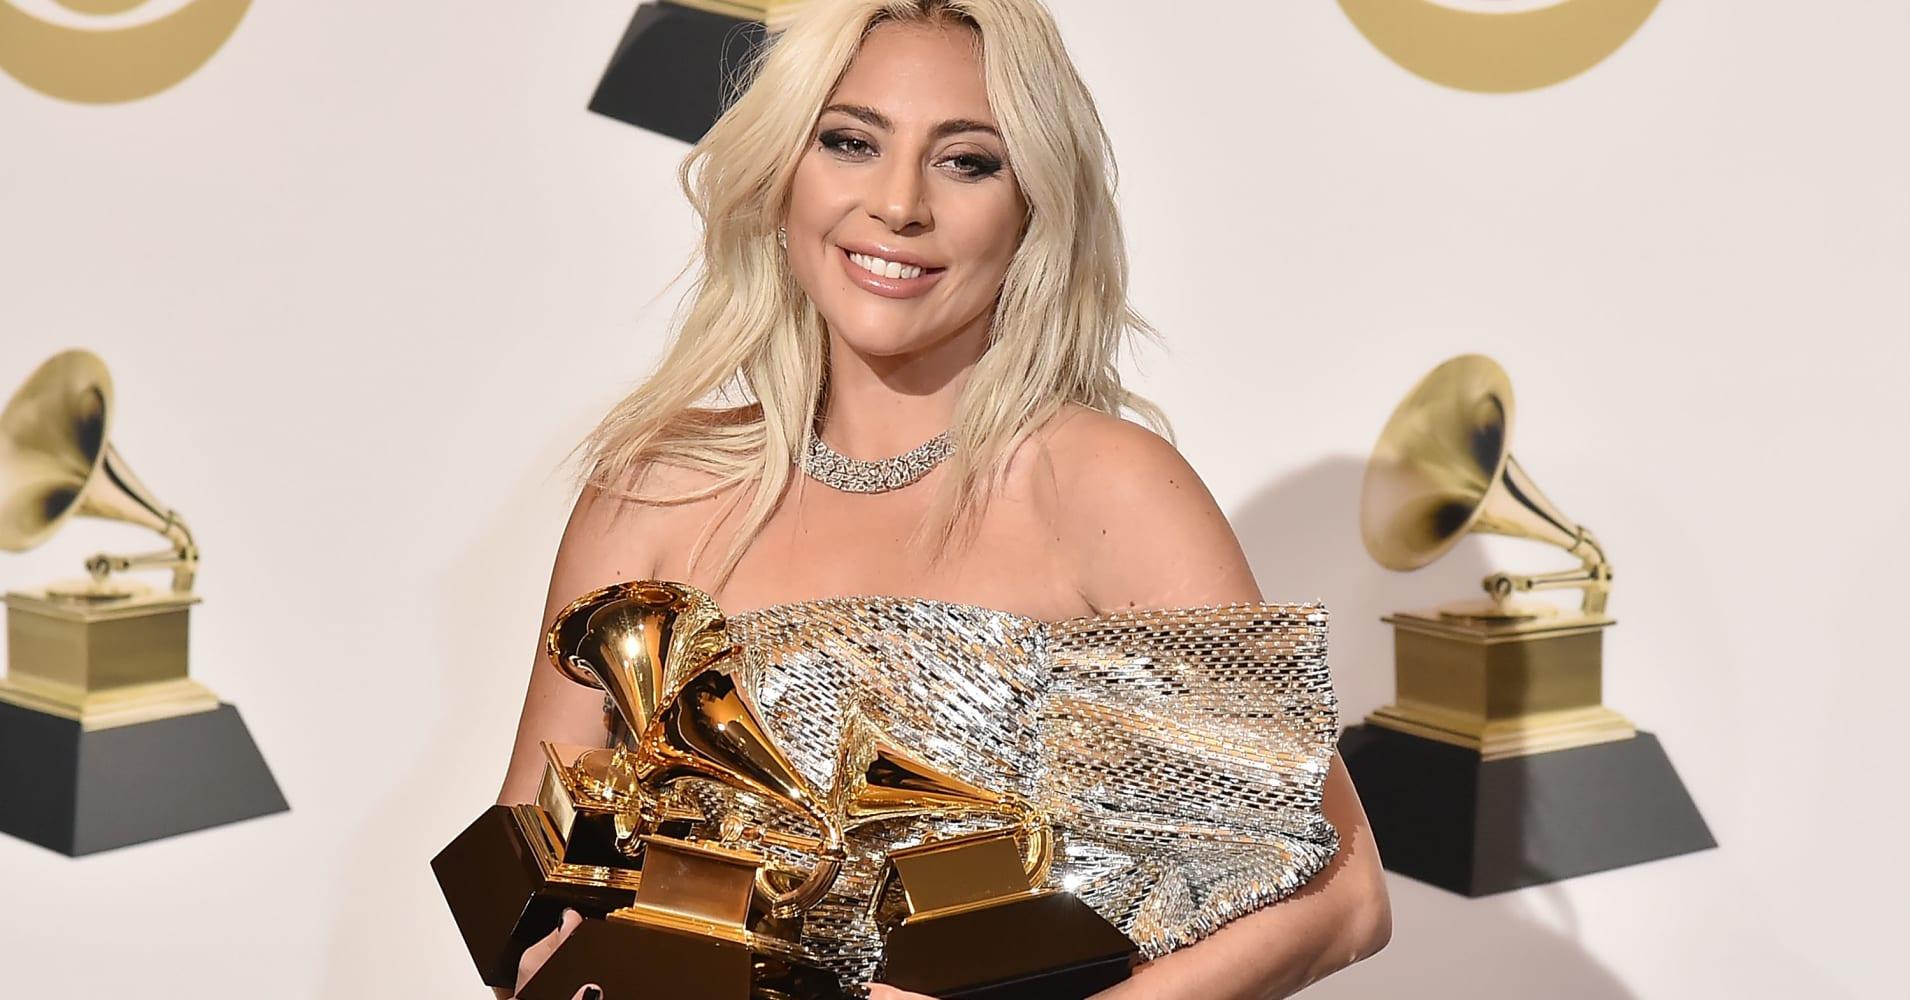 Lady Gaga won 3 awards at the 61st Annual Grammys